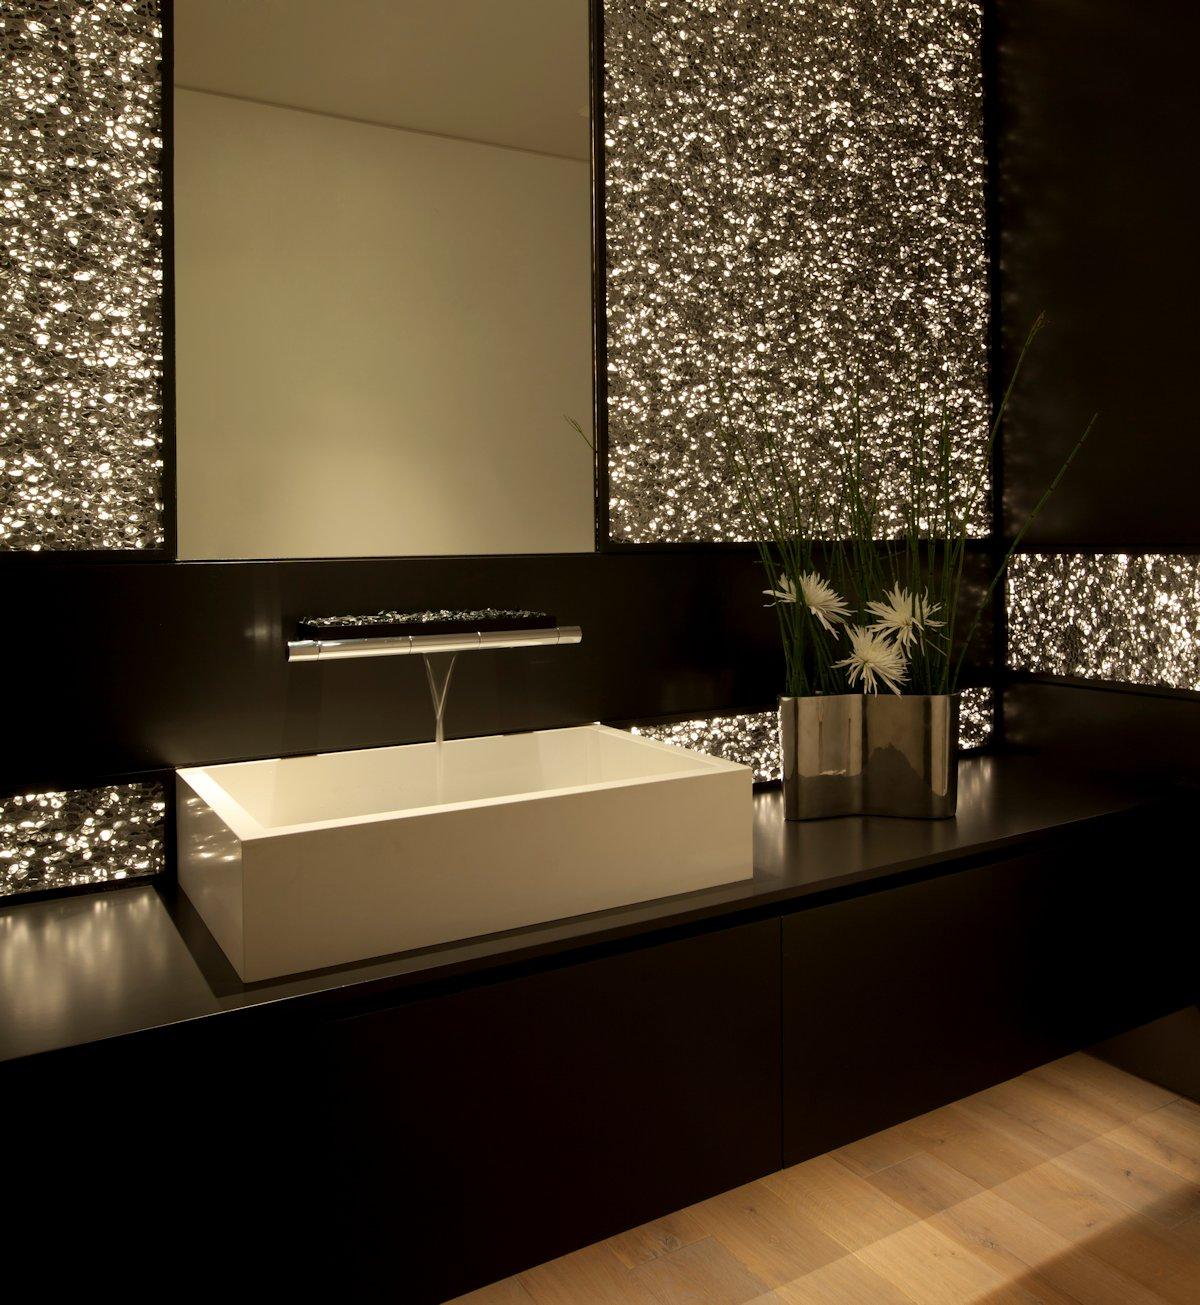 Sparkly Bathroom, Sink, Beach House in Laguna Beach, California